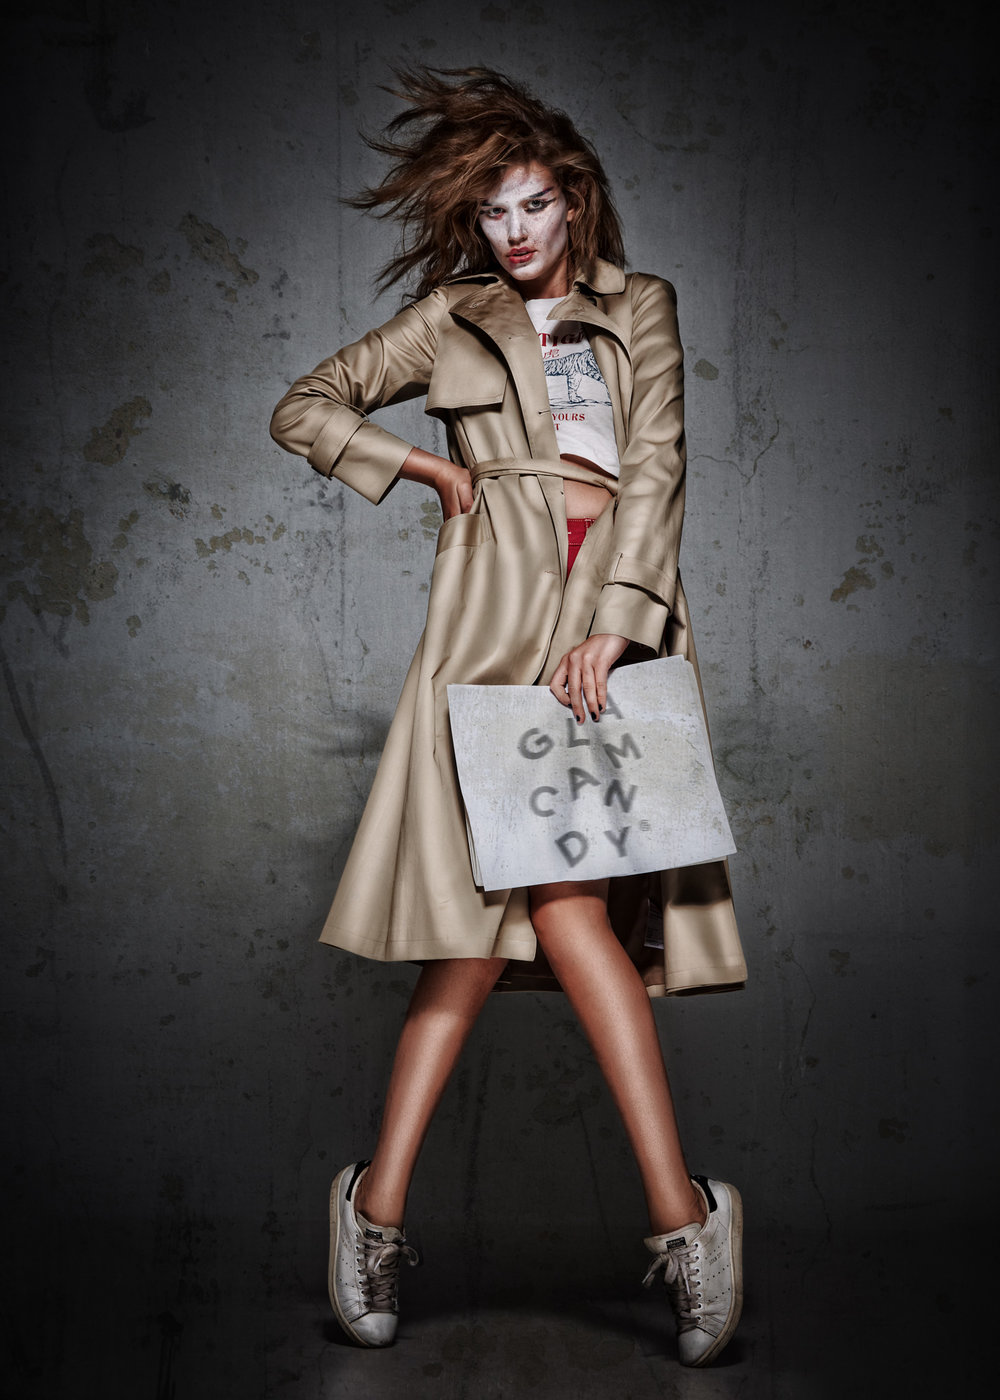 FashionEditorial_JenaCartledge.jpg